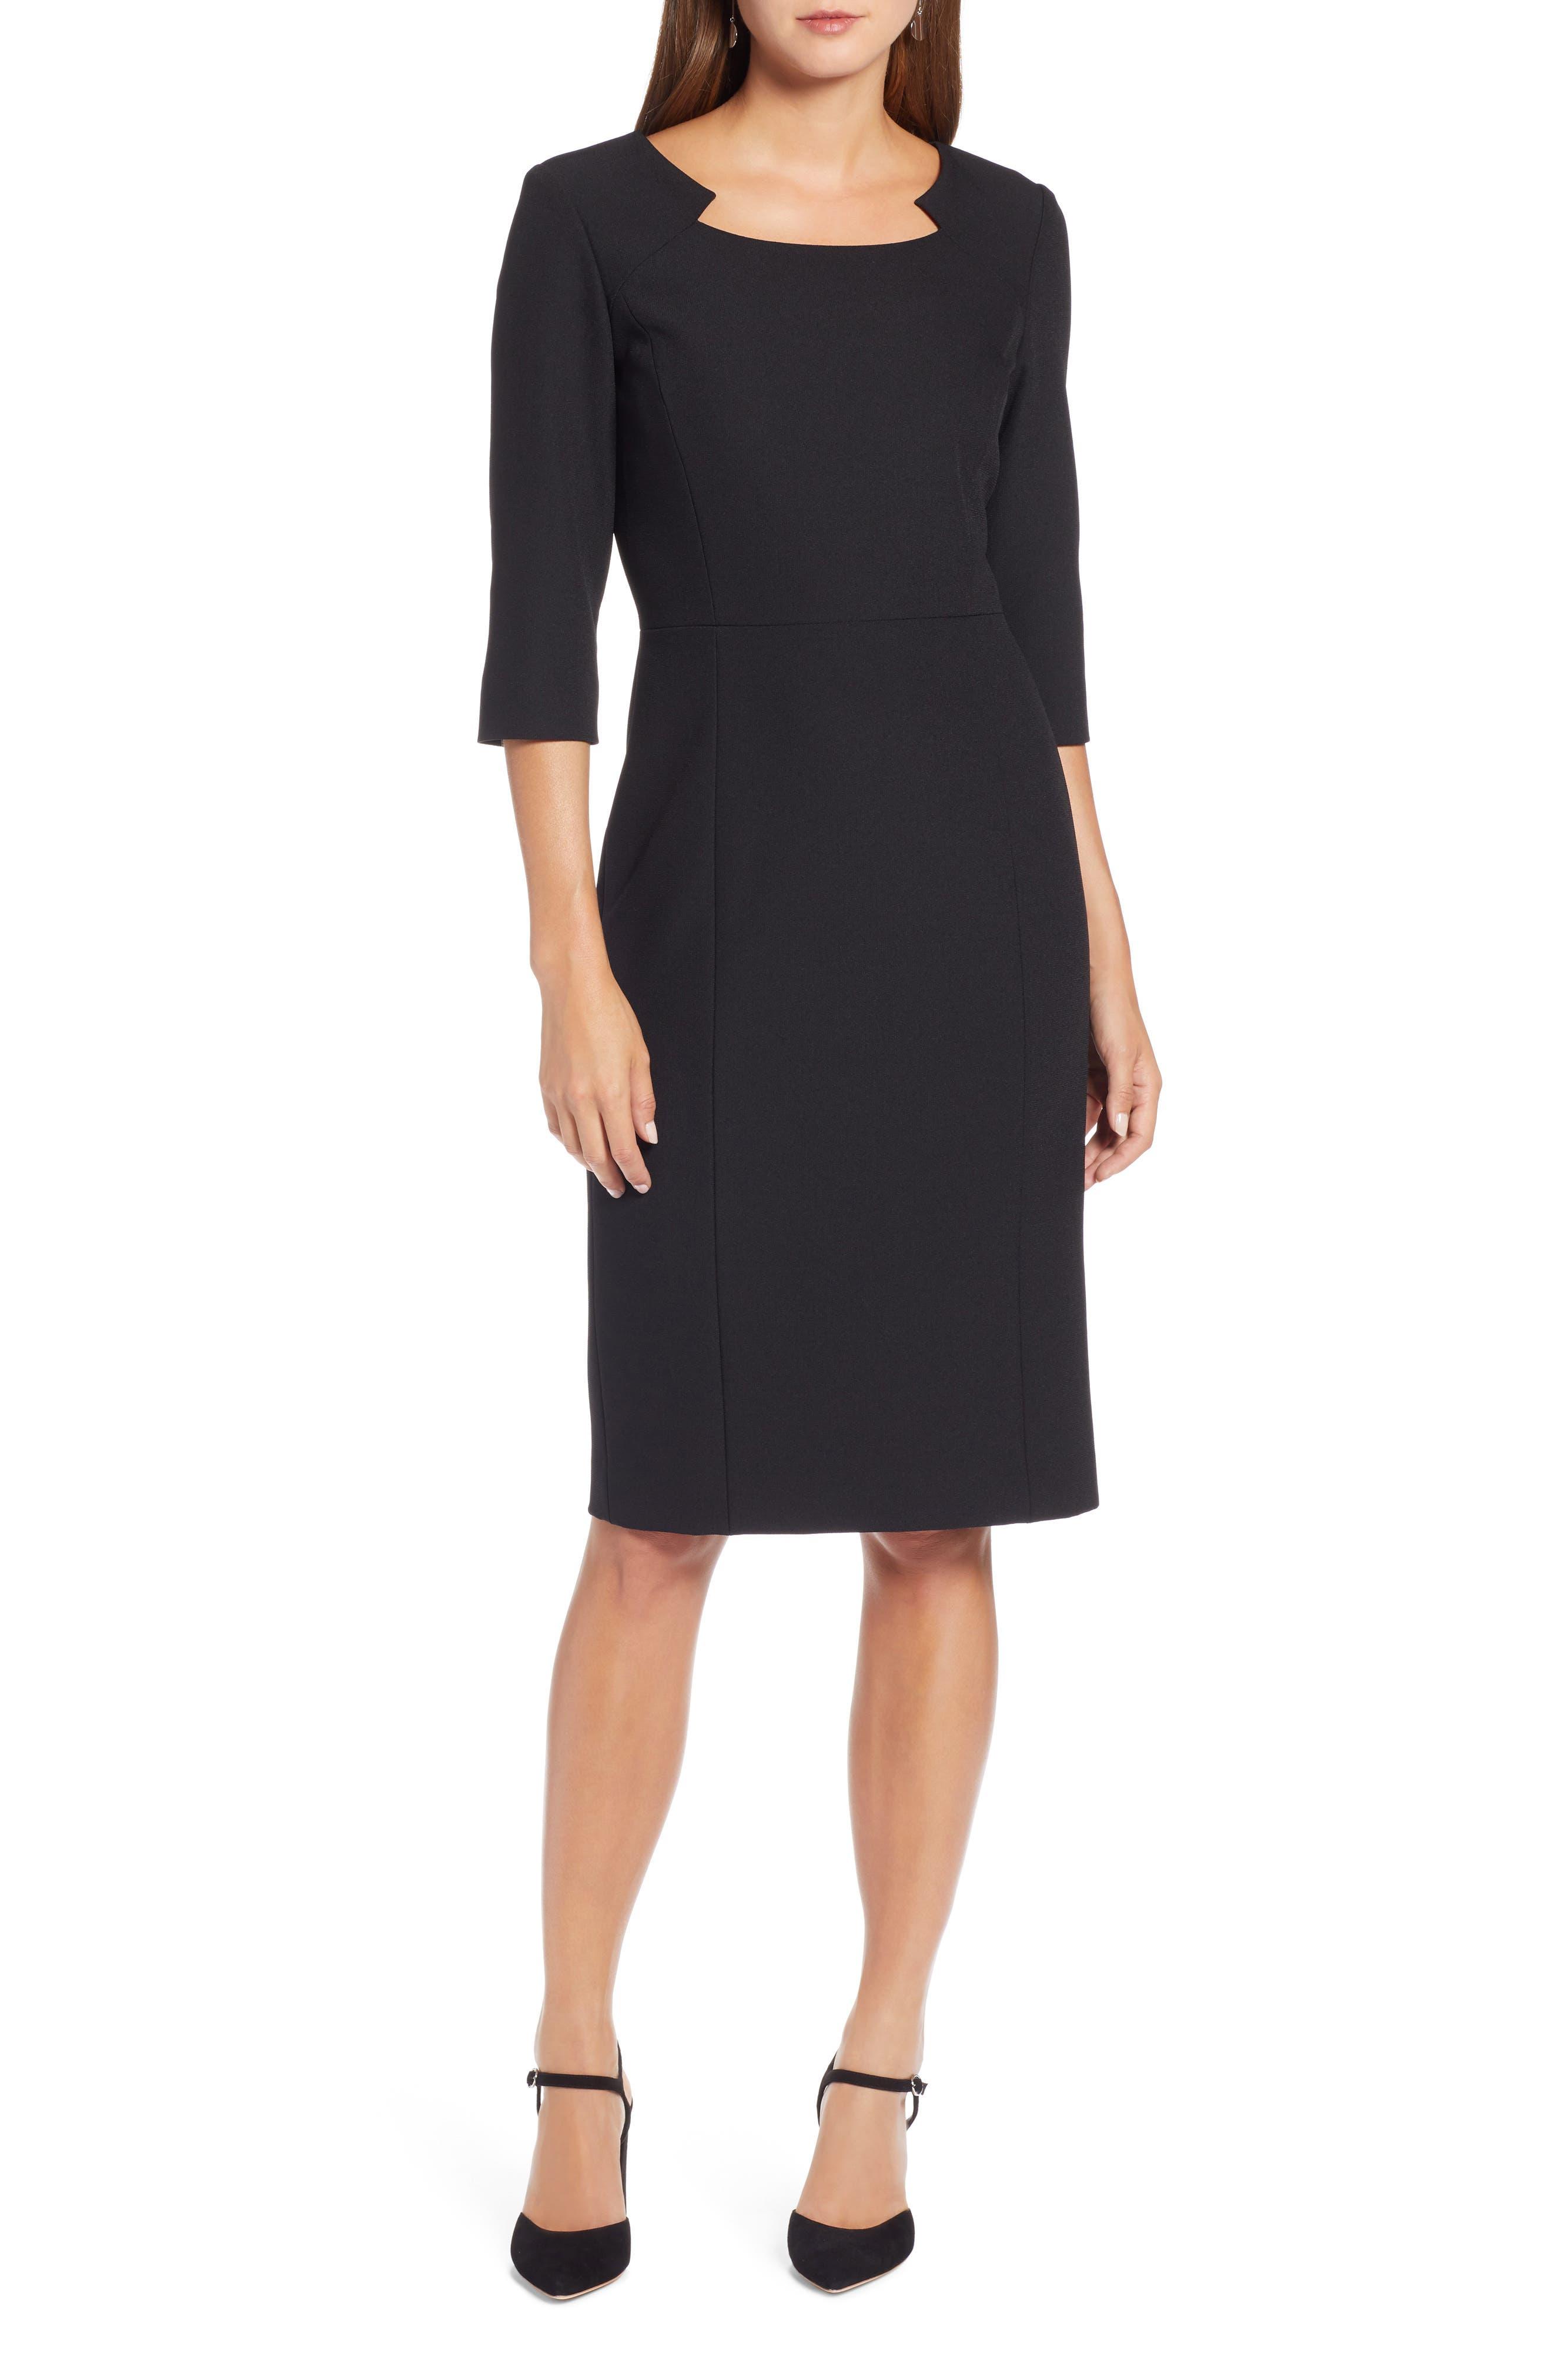 Petite Halogen Textured Stretch Sheath Dress, Black